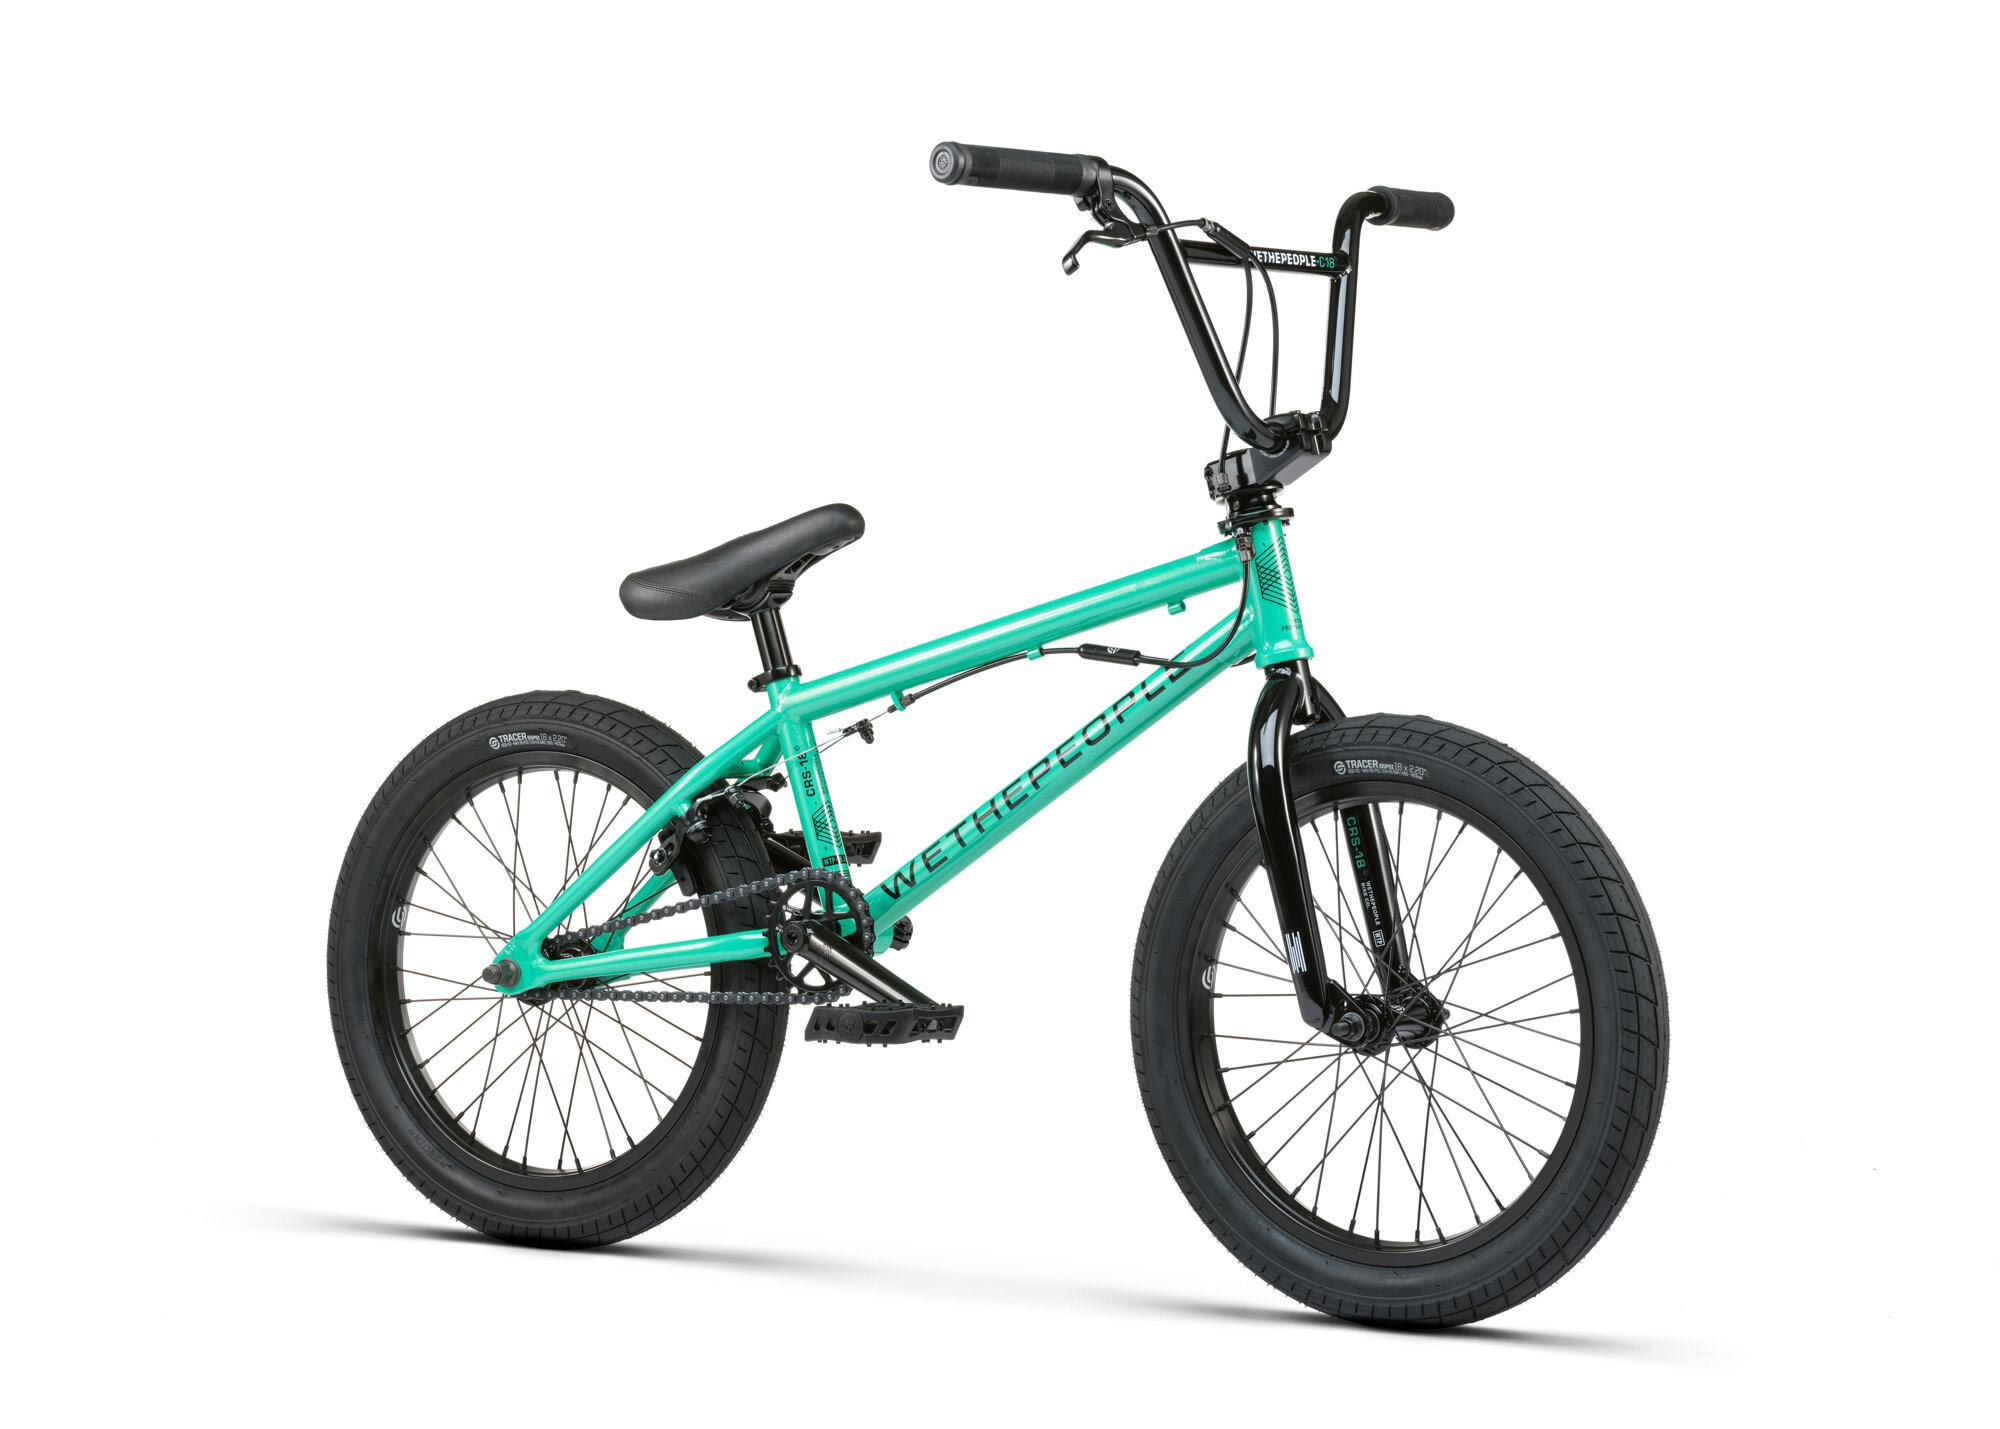 BMX WETHEPEOPLE CRS 18 FS 2021